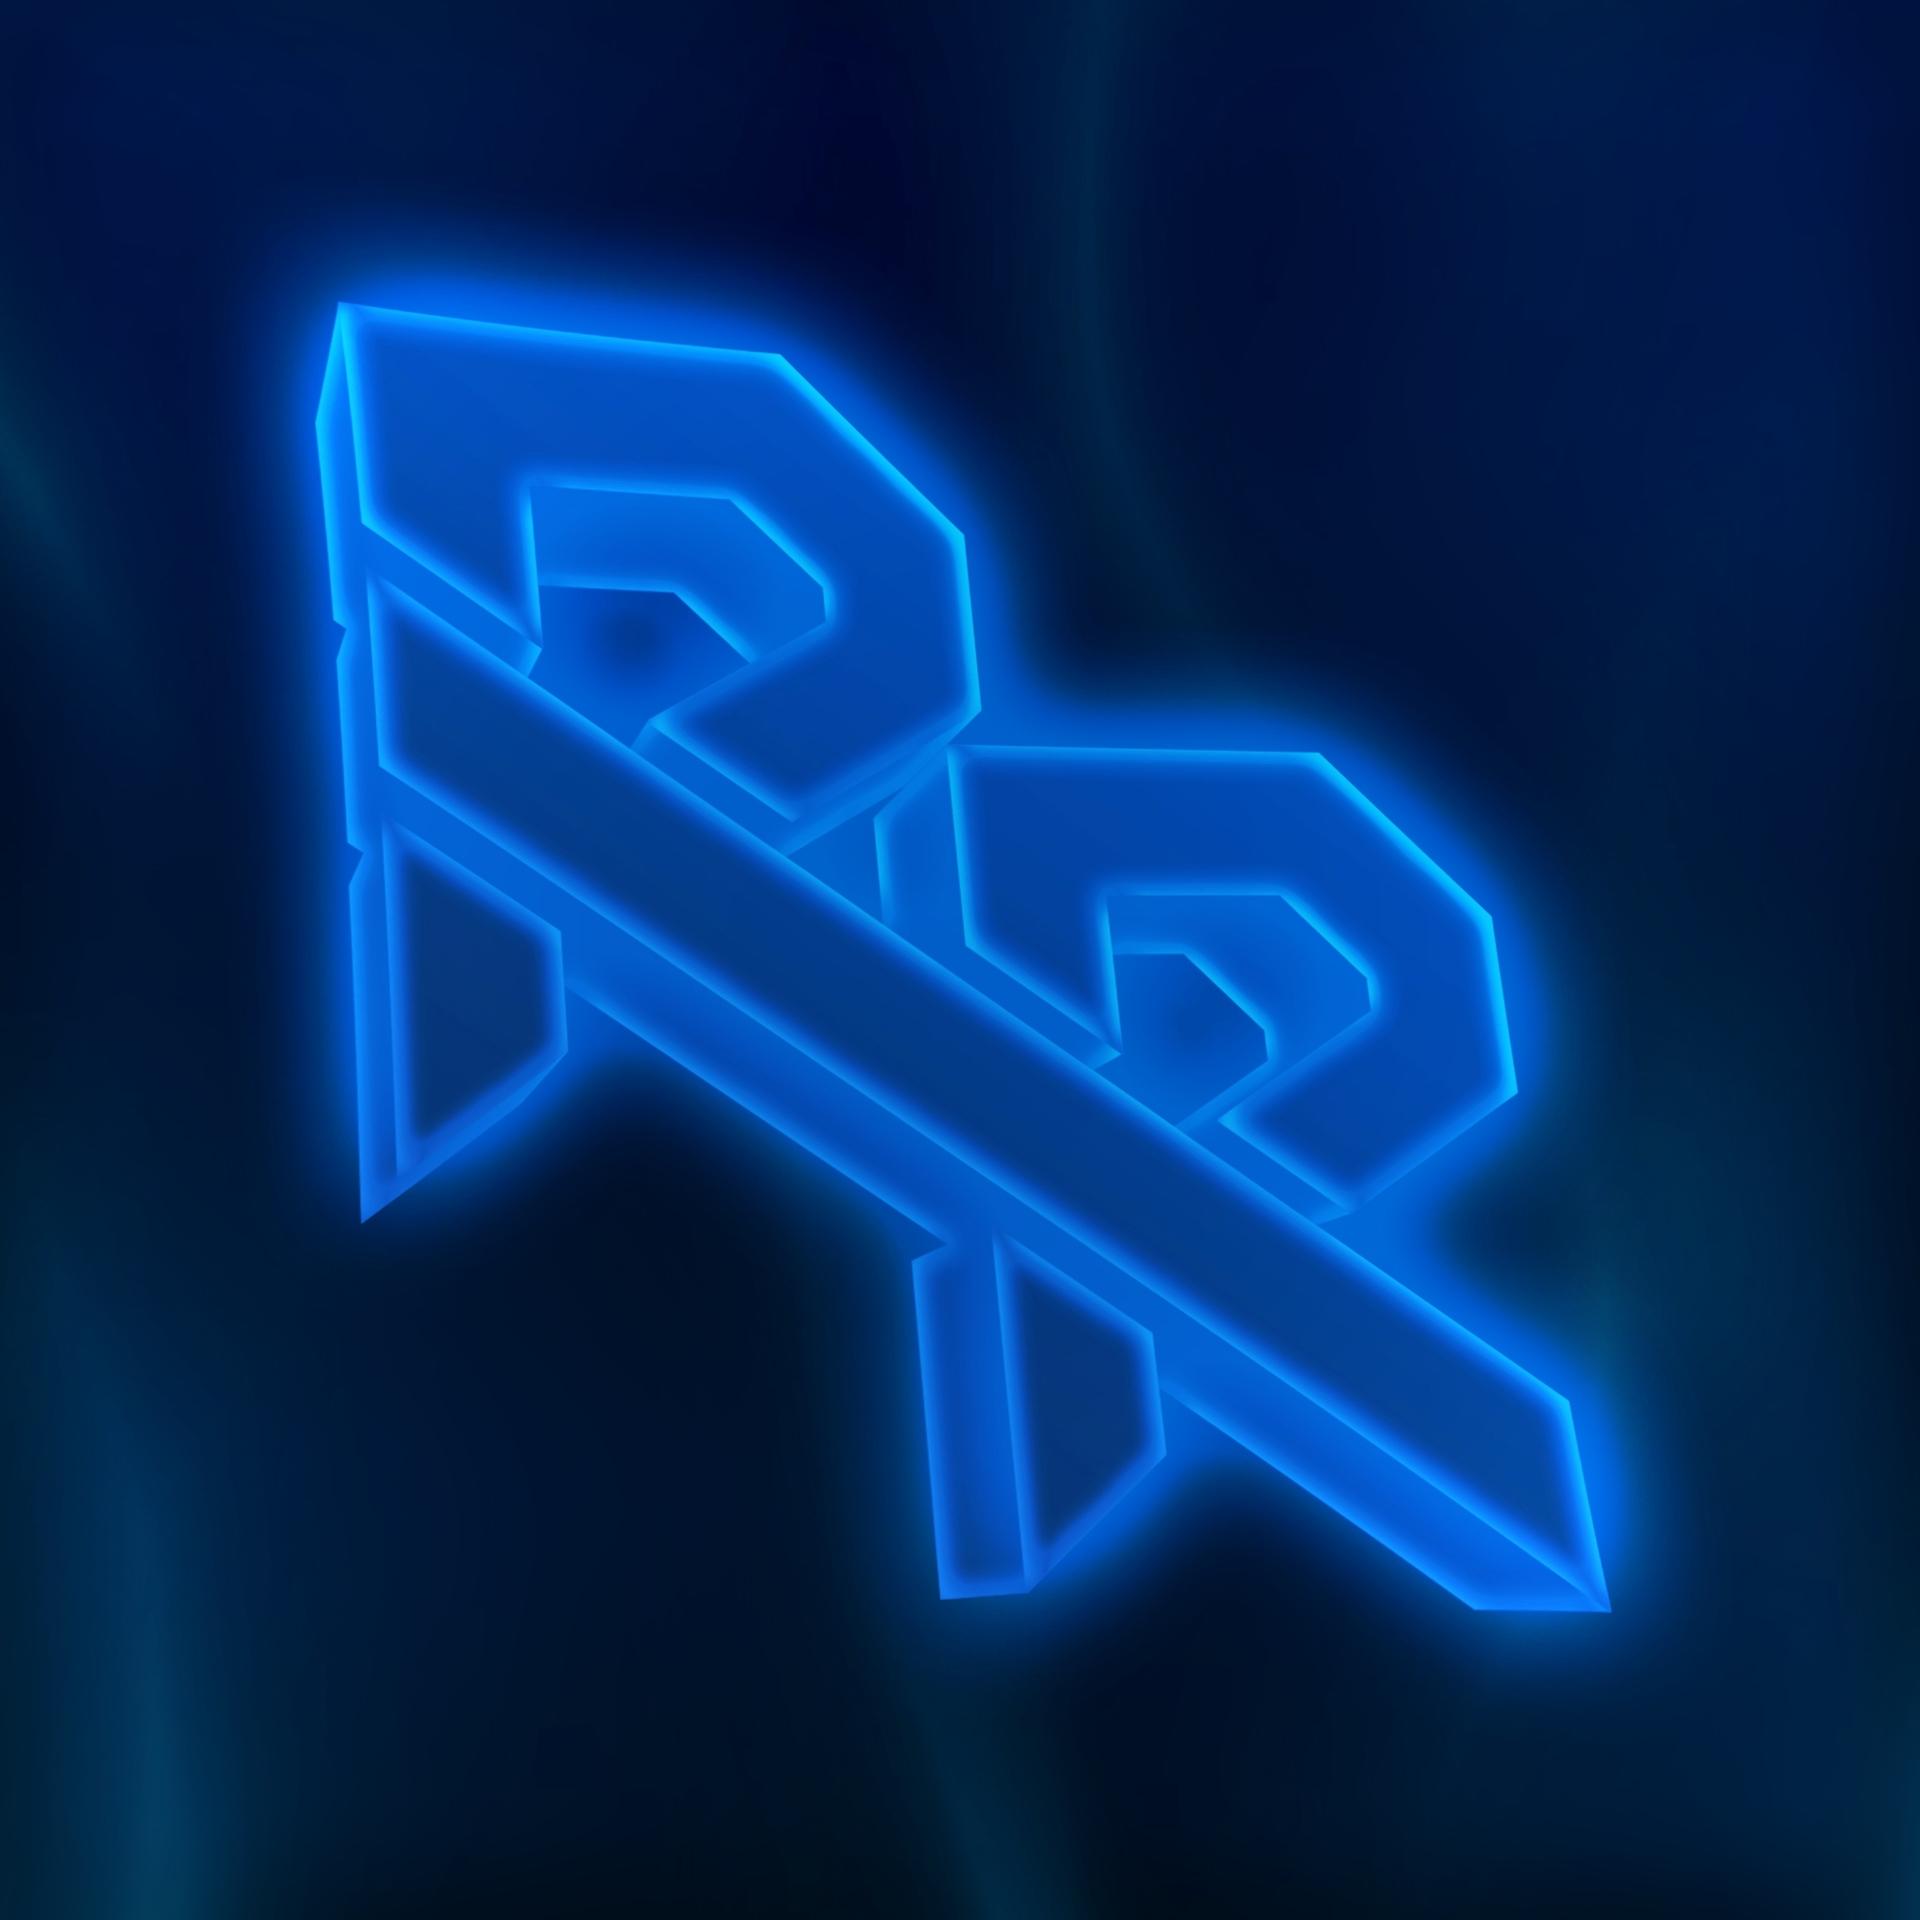 Team RRisk